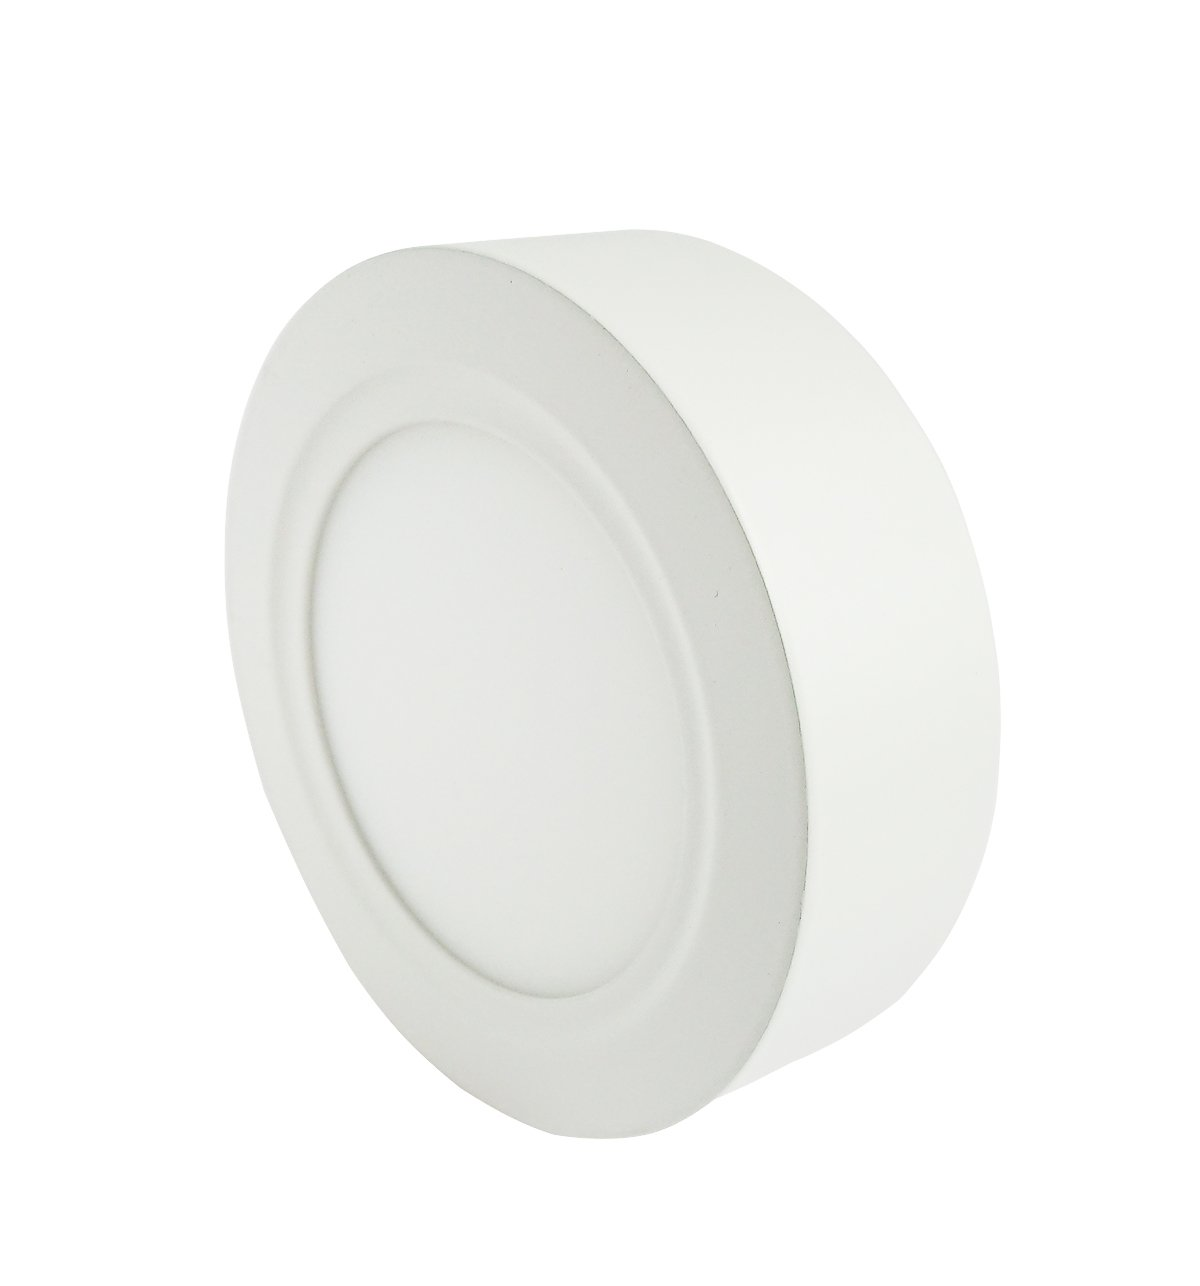 LED plafon de superficie Lumentech LED downlight de superficie 6W 4000K redondo blanco